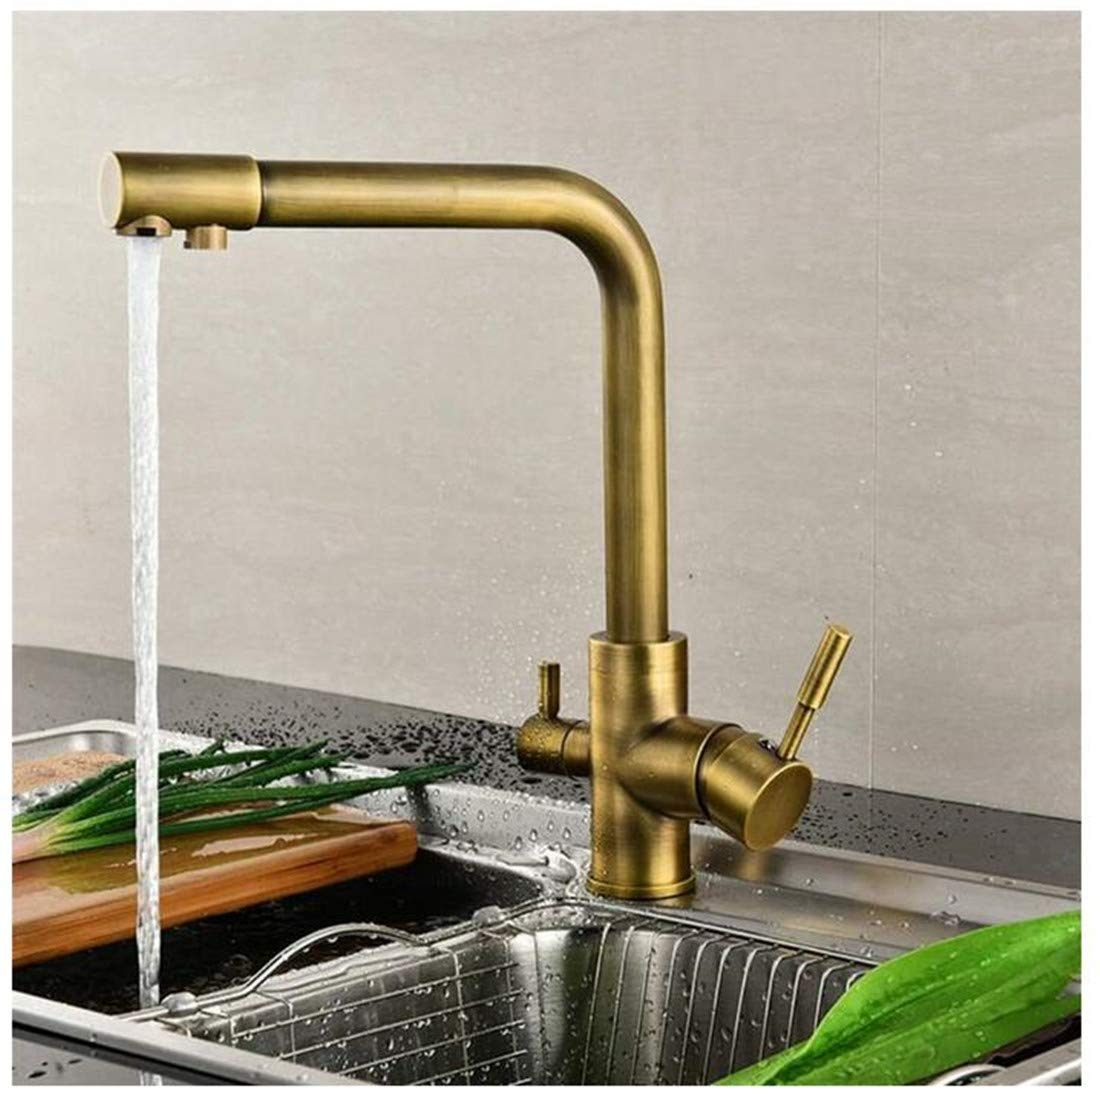 Kitchen Bath Basin Sink Bathroom Taps Basin Sink Mixer Taps Bathroom Kitchen Sink Taps Hot and Cold Water Ctzl2838